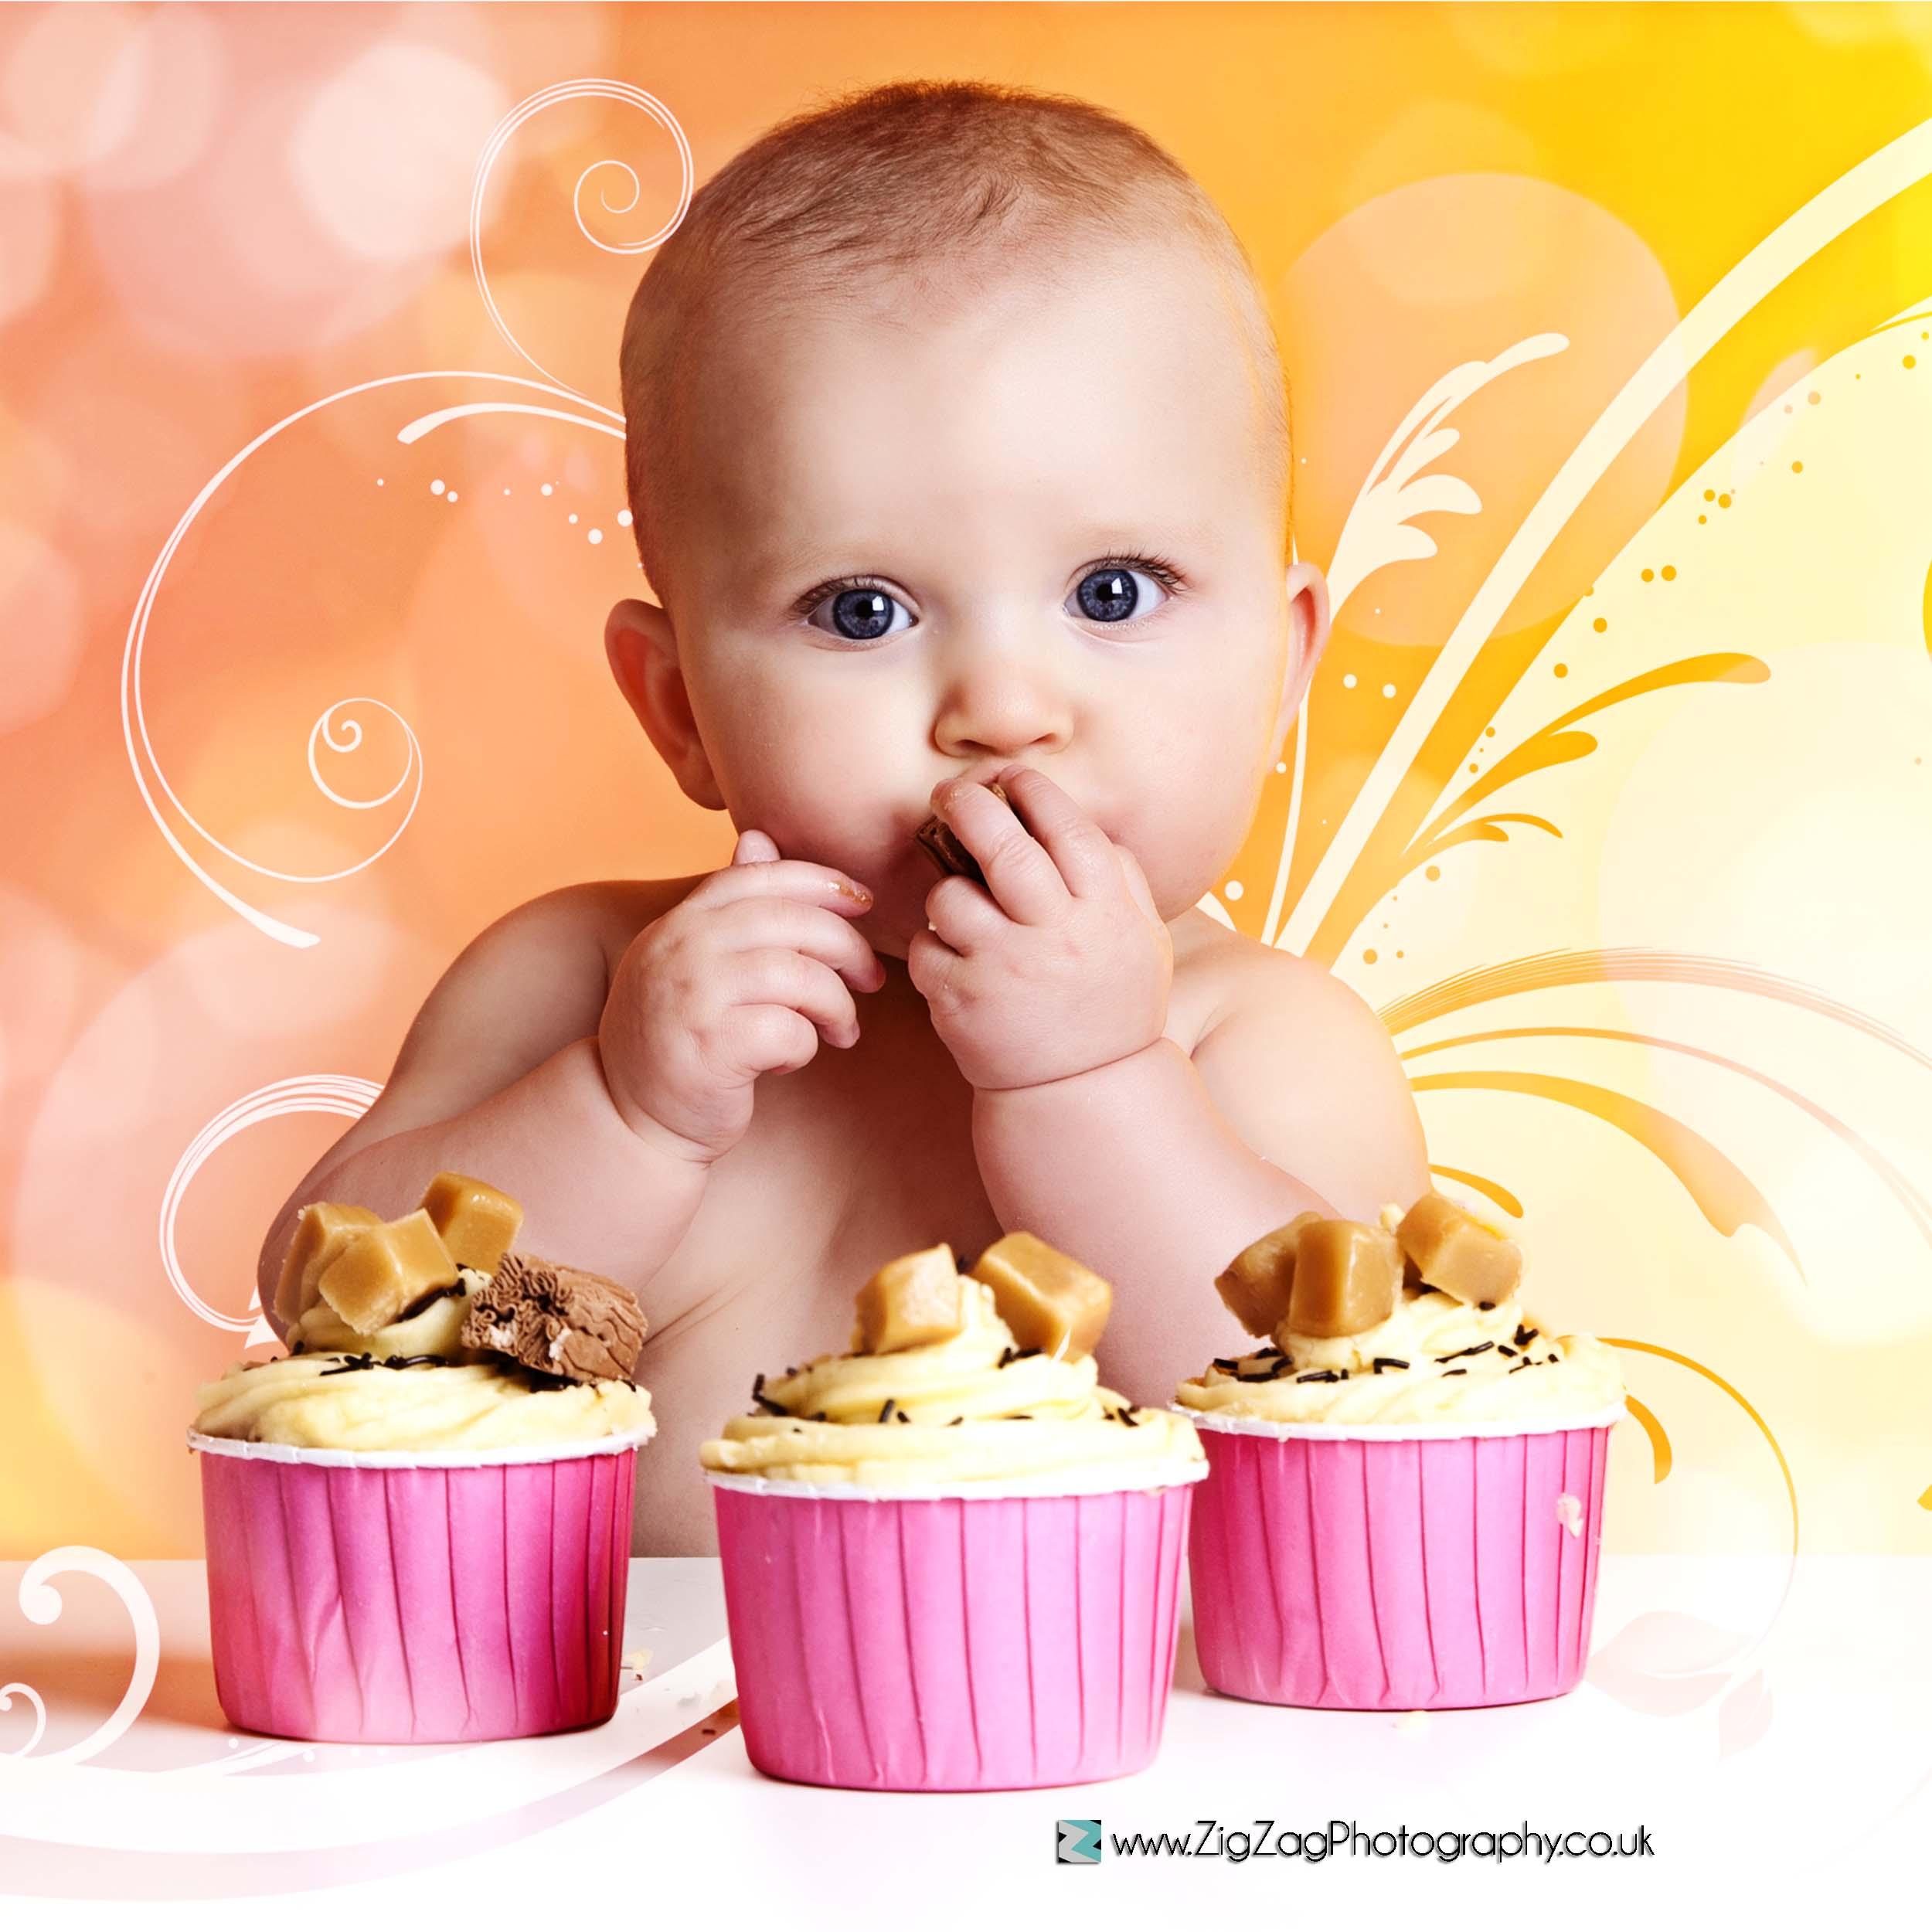 photography-session-leicester-studio-photoshoot-zigzag-baby-cakesmash-cake-smash-birthday-celebrate-cupcake-food-ideas-propsd-cute.jpg